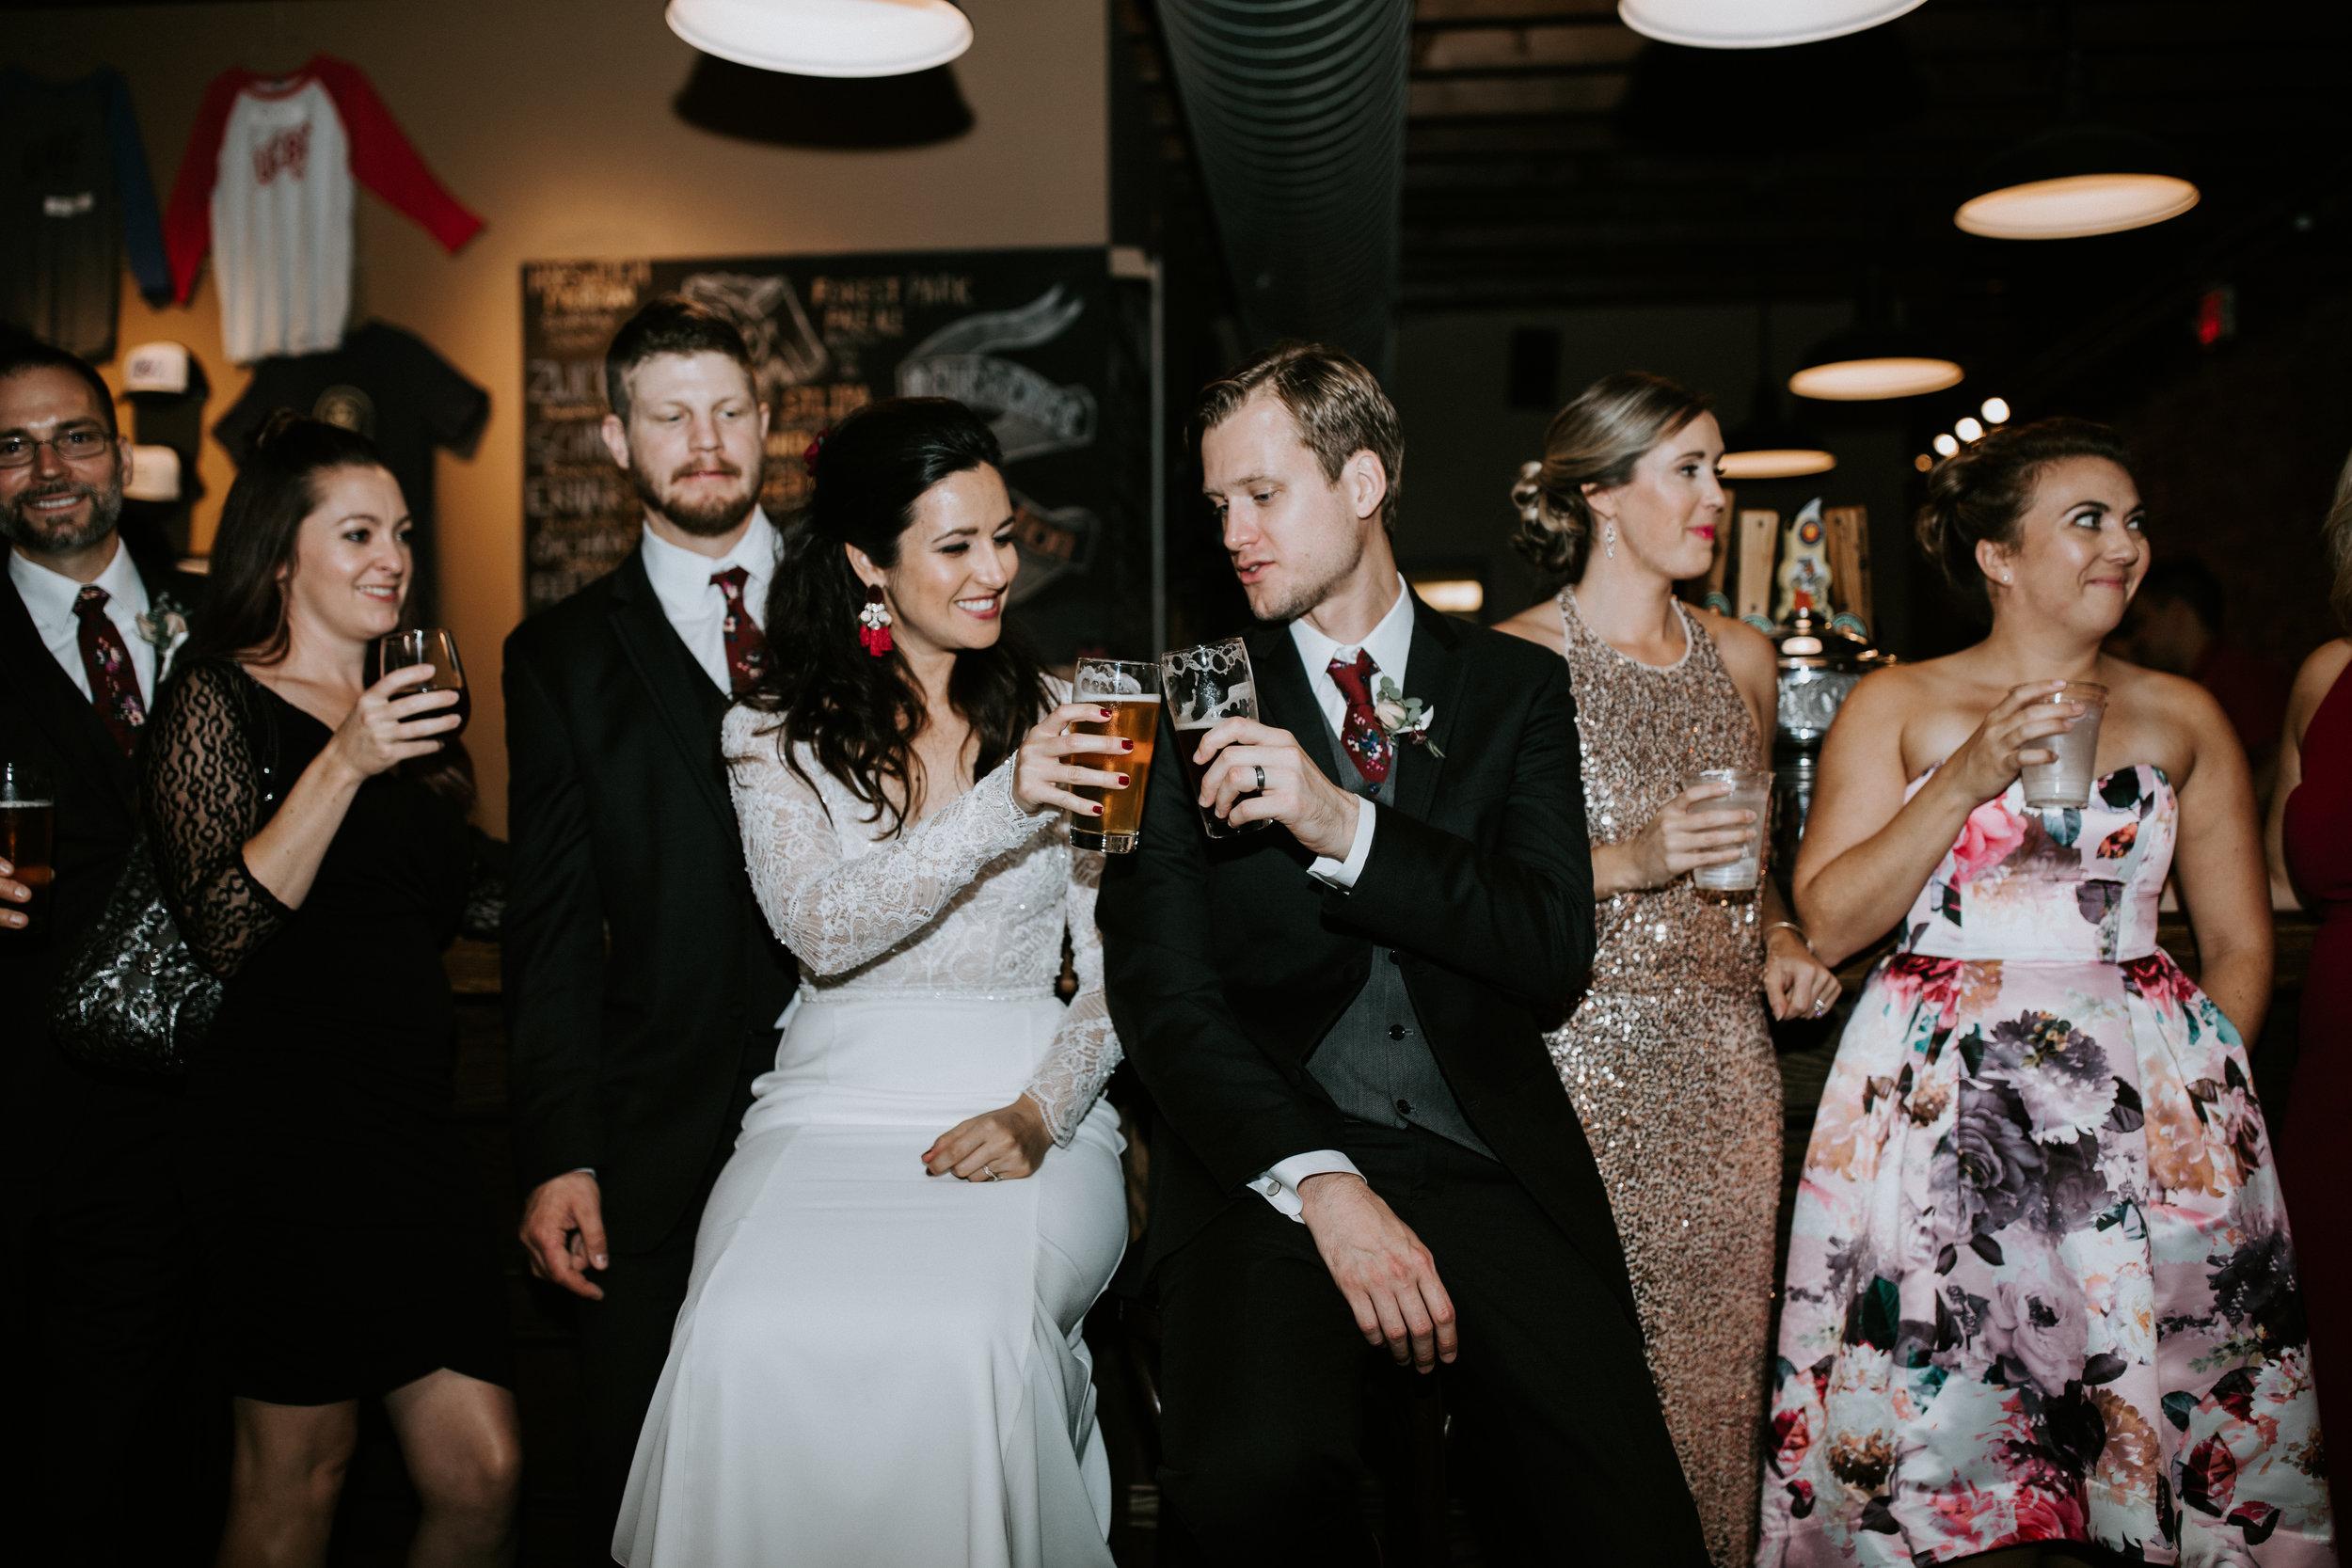 st-louis-missouri-wedding-photographer-tower-grove-park-sheldon-concert-hall-steph+phil-941.jpg